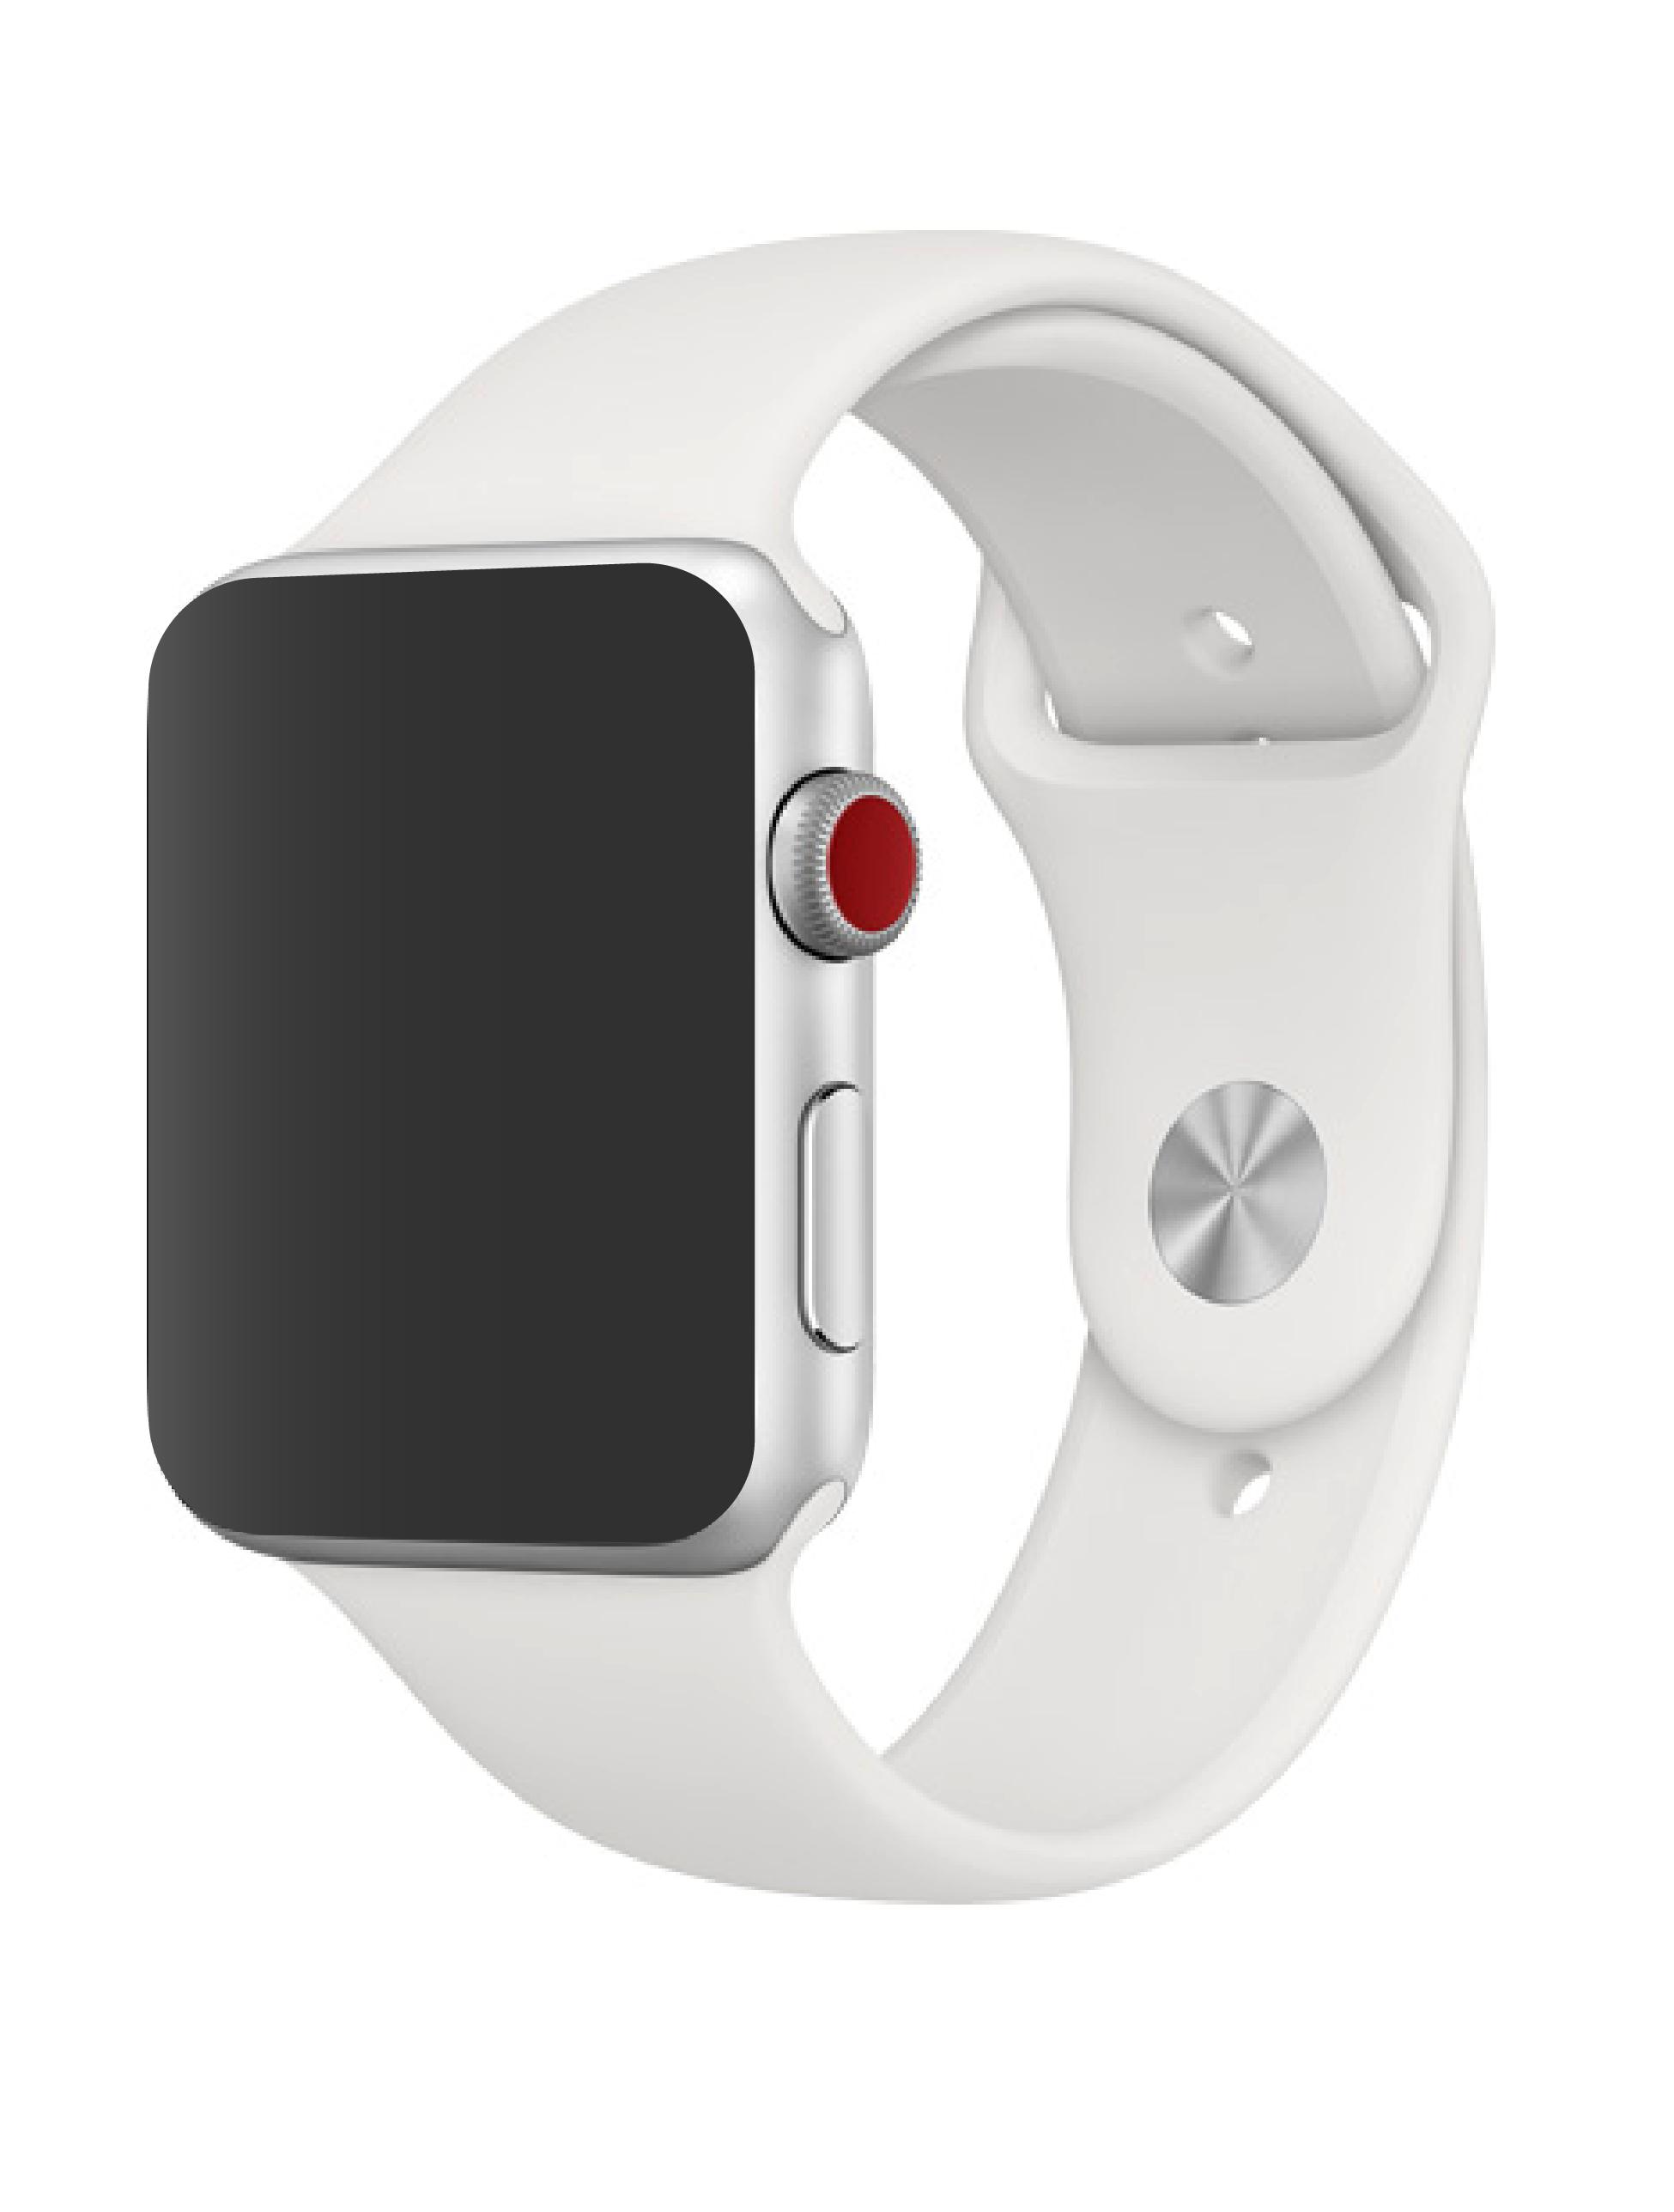 Apple Watch Repair Services, TechRestore